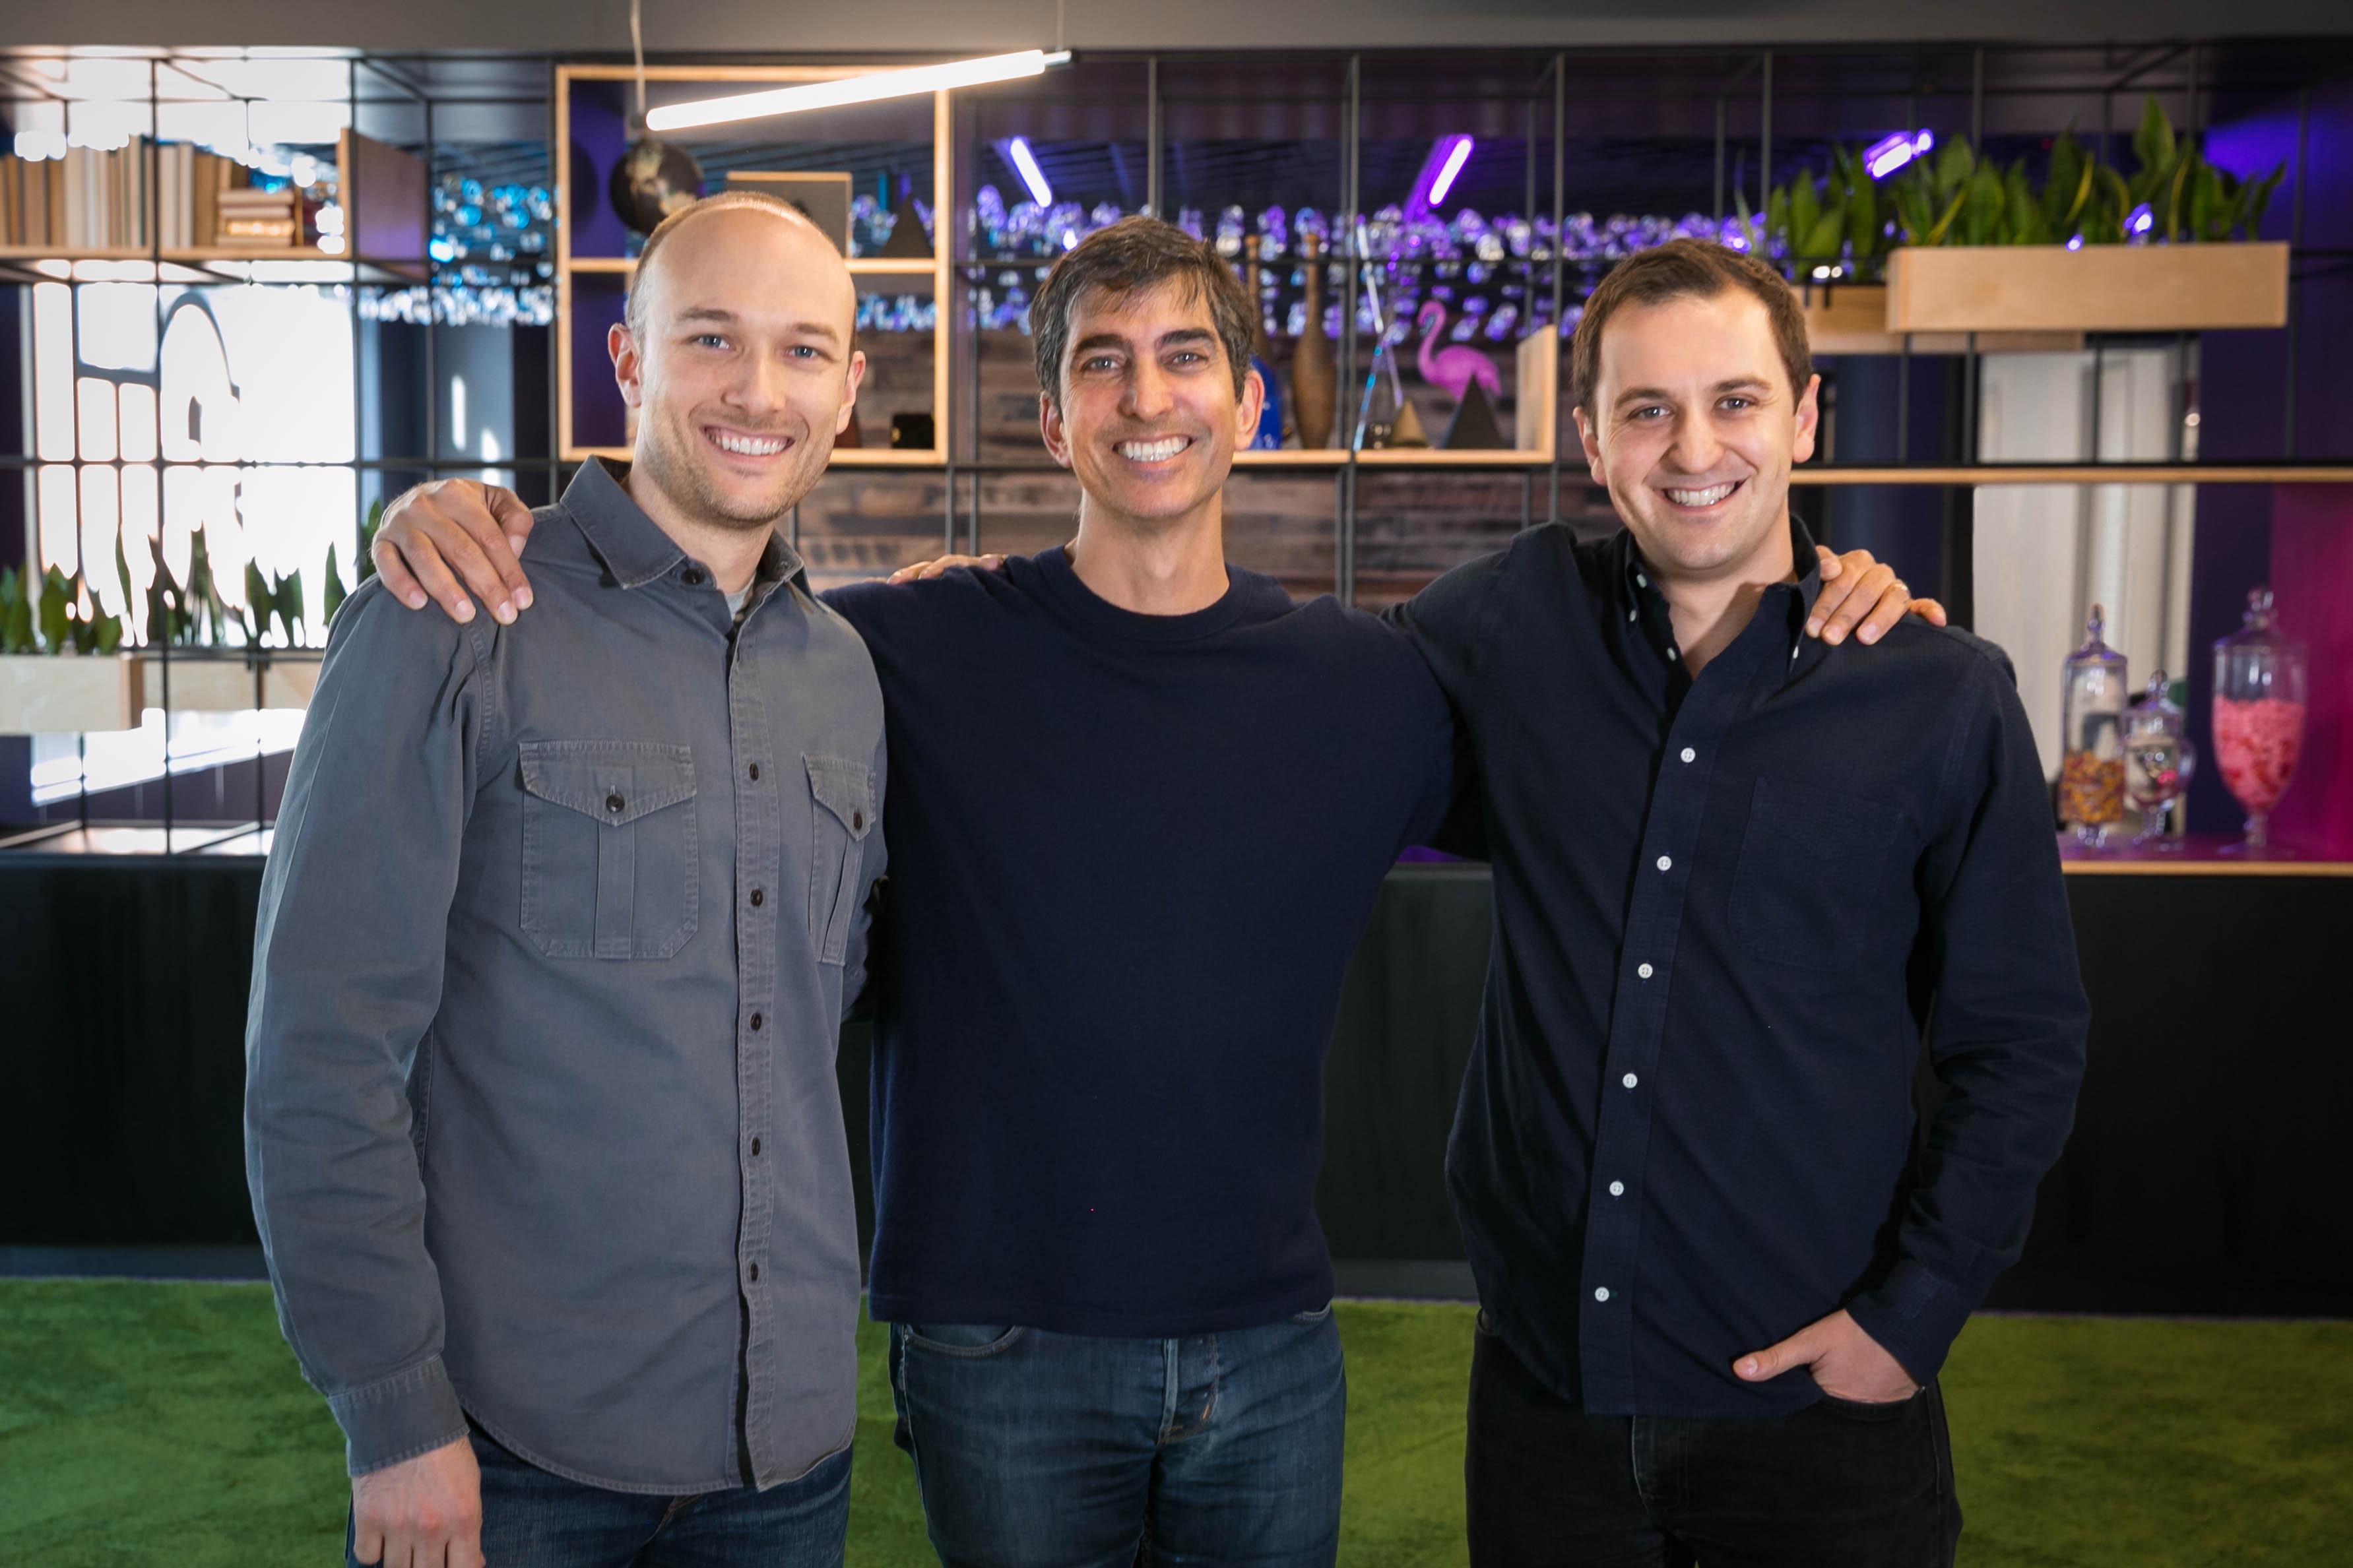 Lyft co-founder Logan Green, CapitalG partner David Lawee, and Lyft co-founder John Zimmer